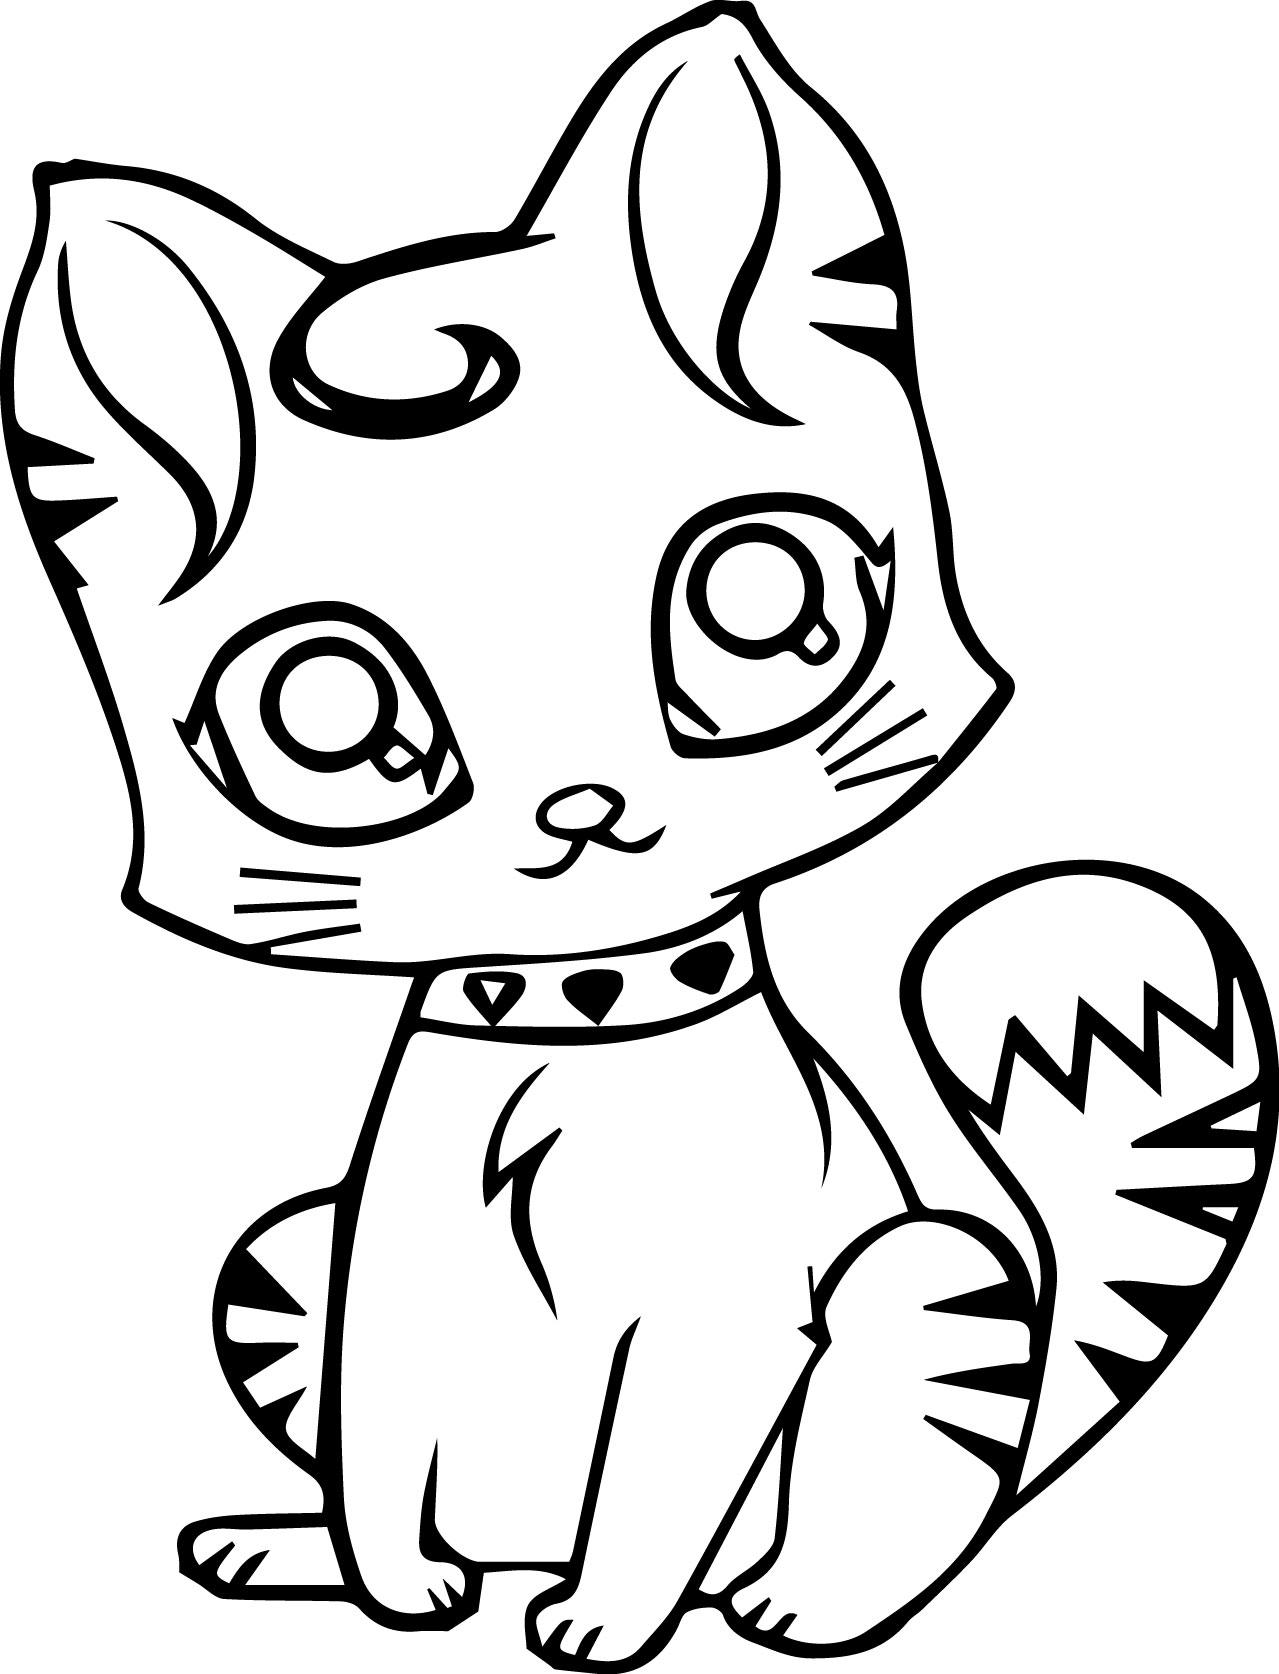 Cute Cartoon Cat Coloring Page | Wecoloringpage.com